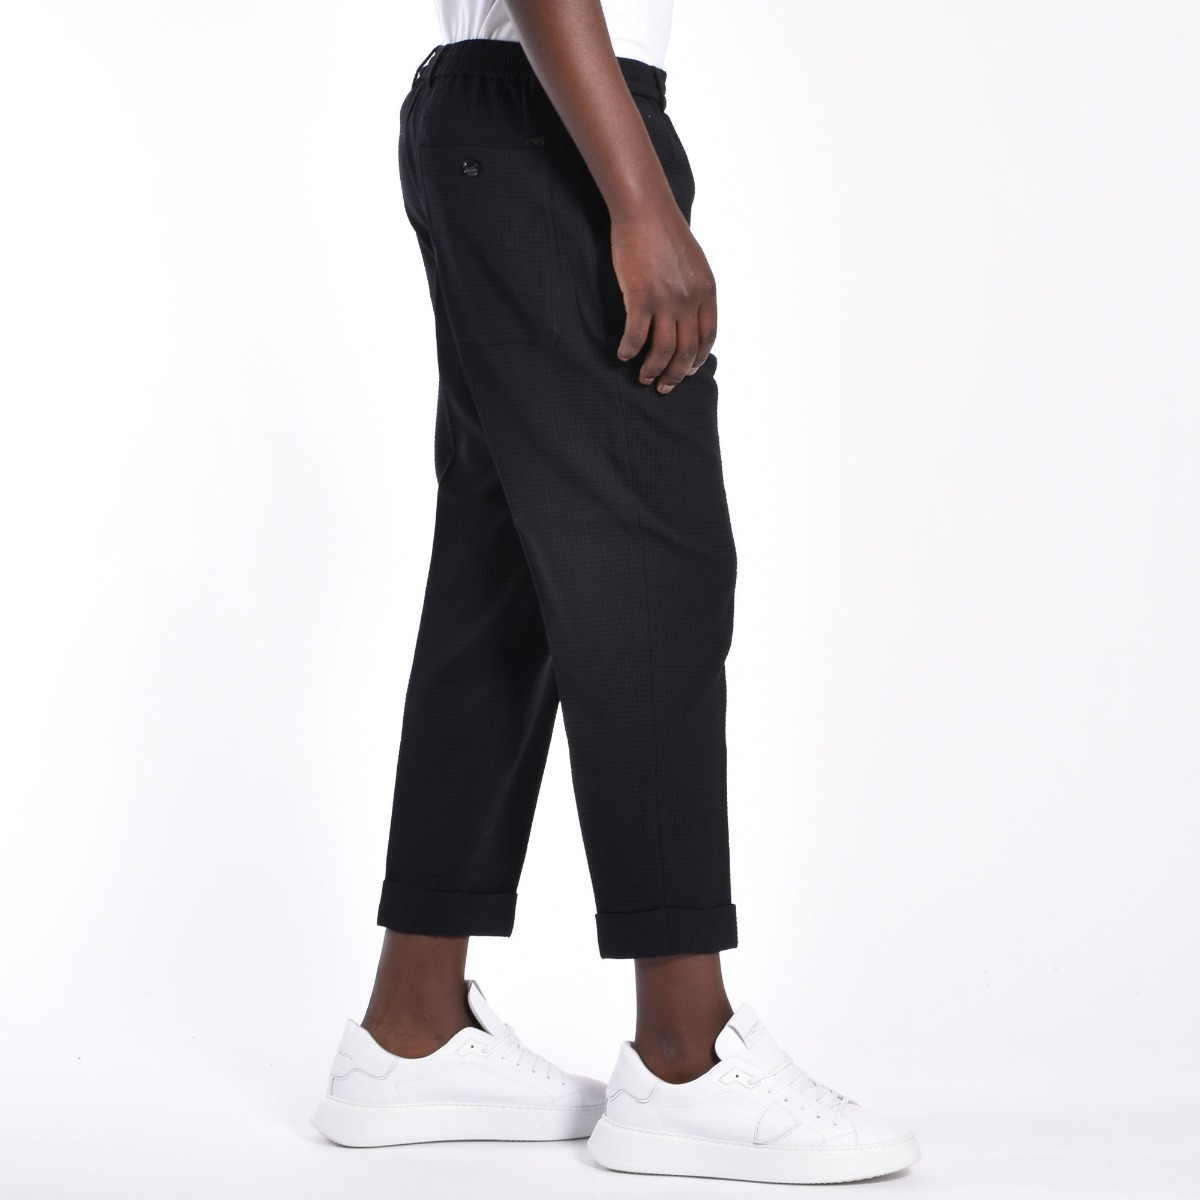 Pantalone tessuto 3d - Nero